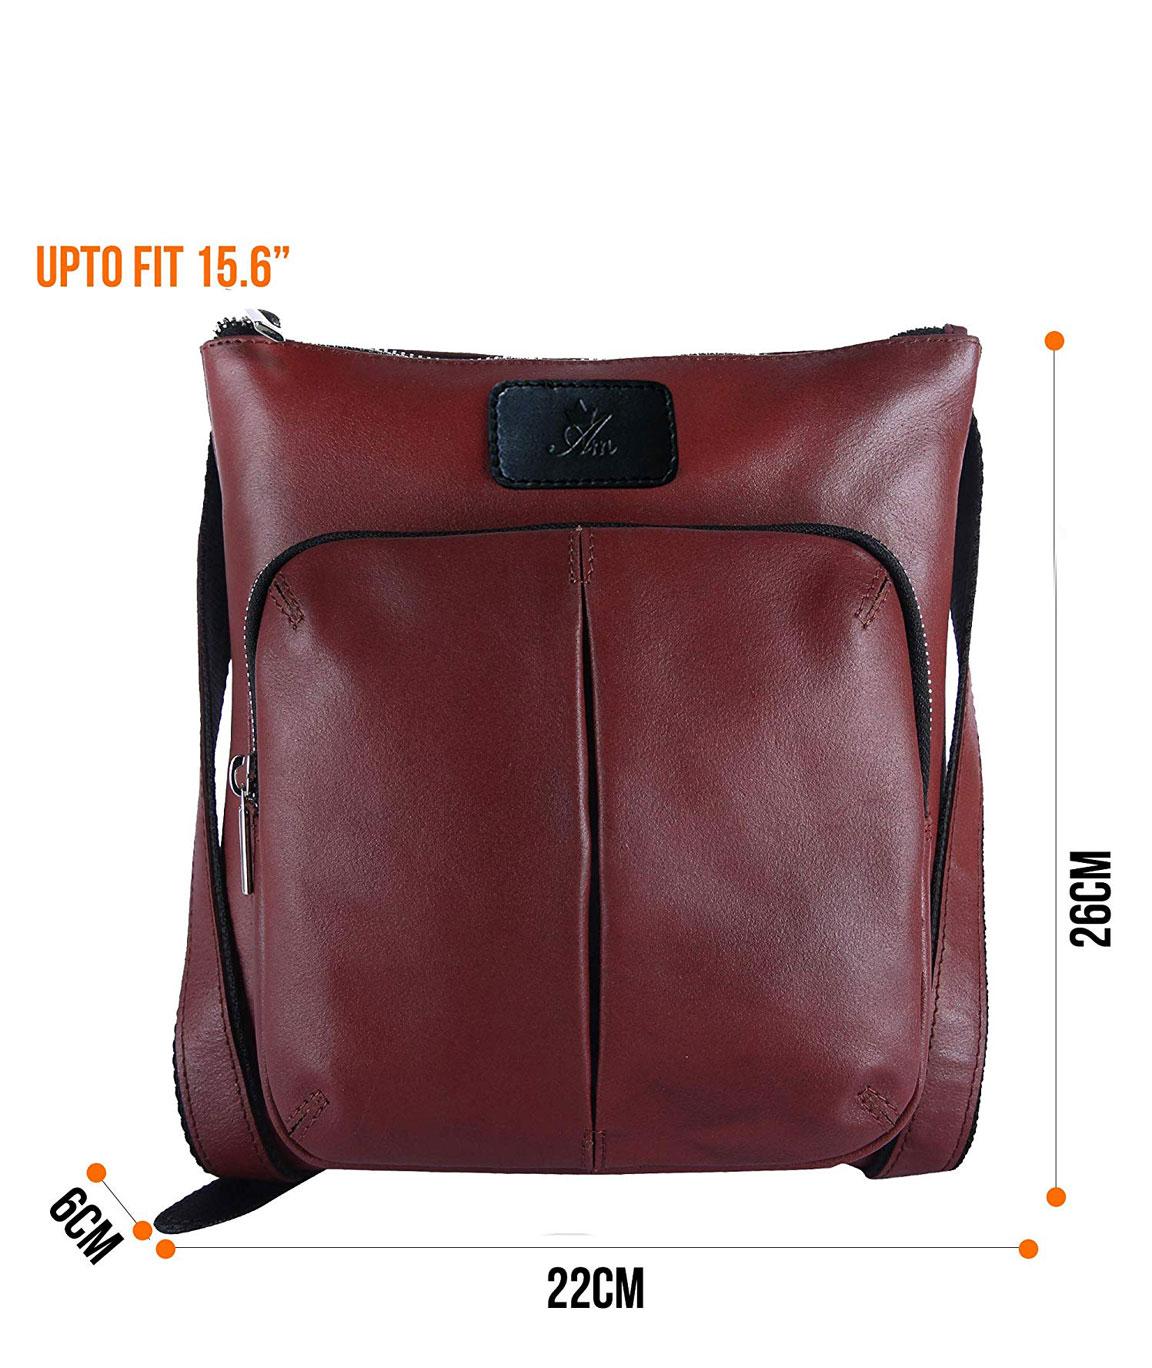 AM LEATHER Brown Colour Genuine Leather Unisex Messenger Bag